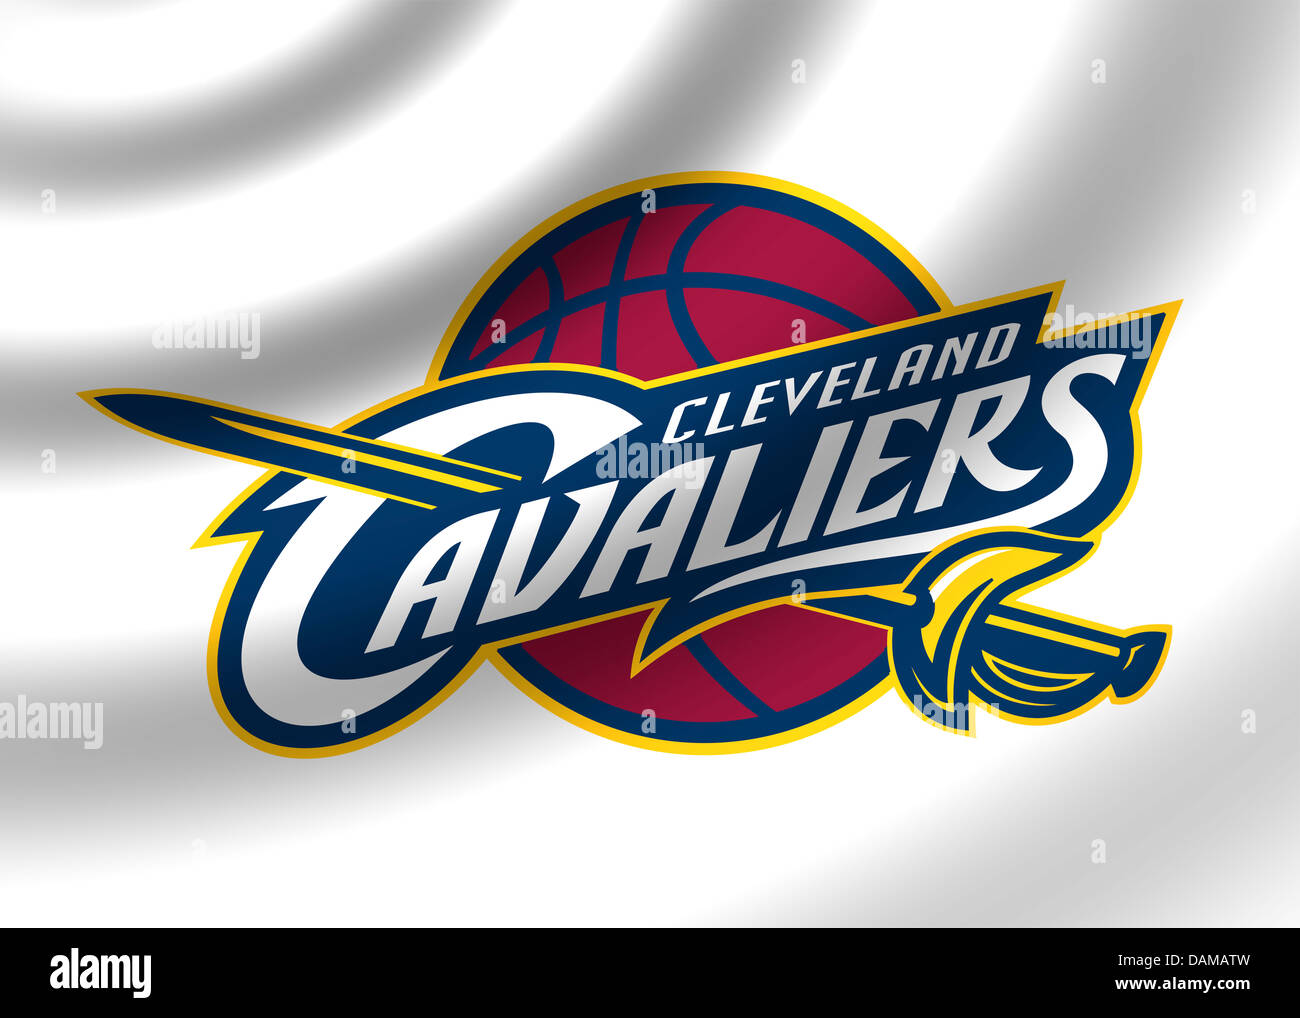 Cleveland Cavaliers Logo Symbol Icon Stock Photos Cleveland